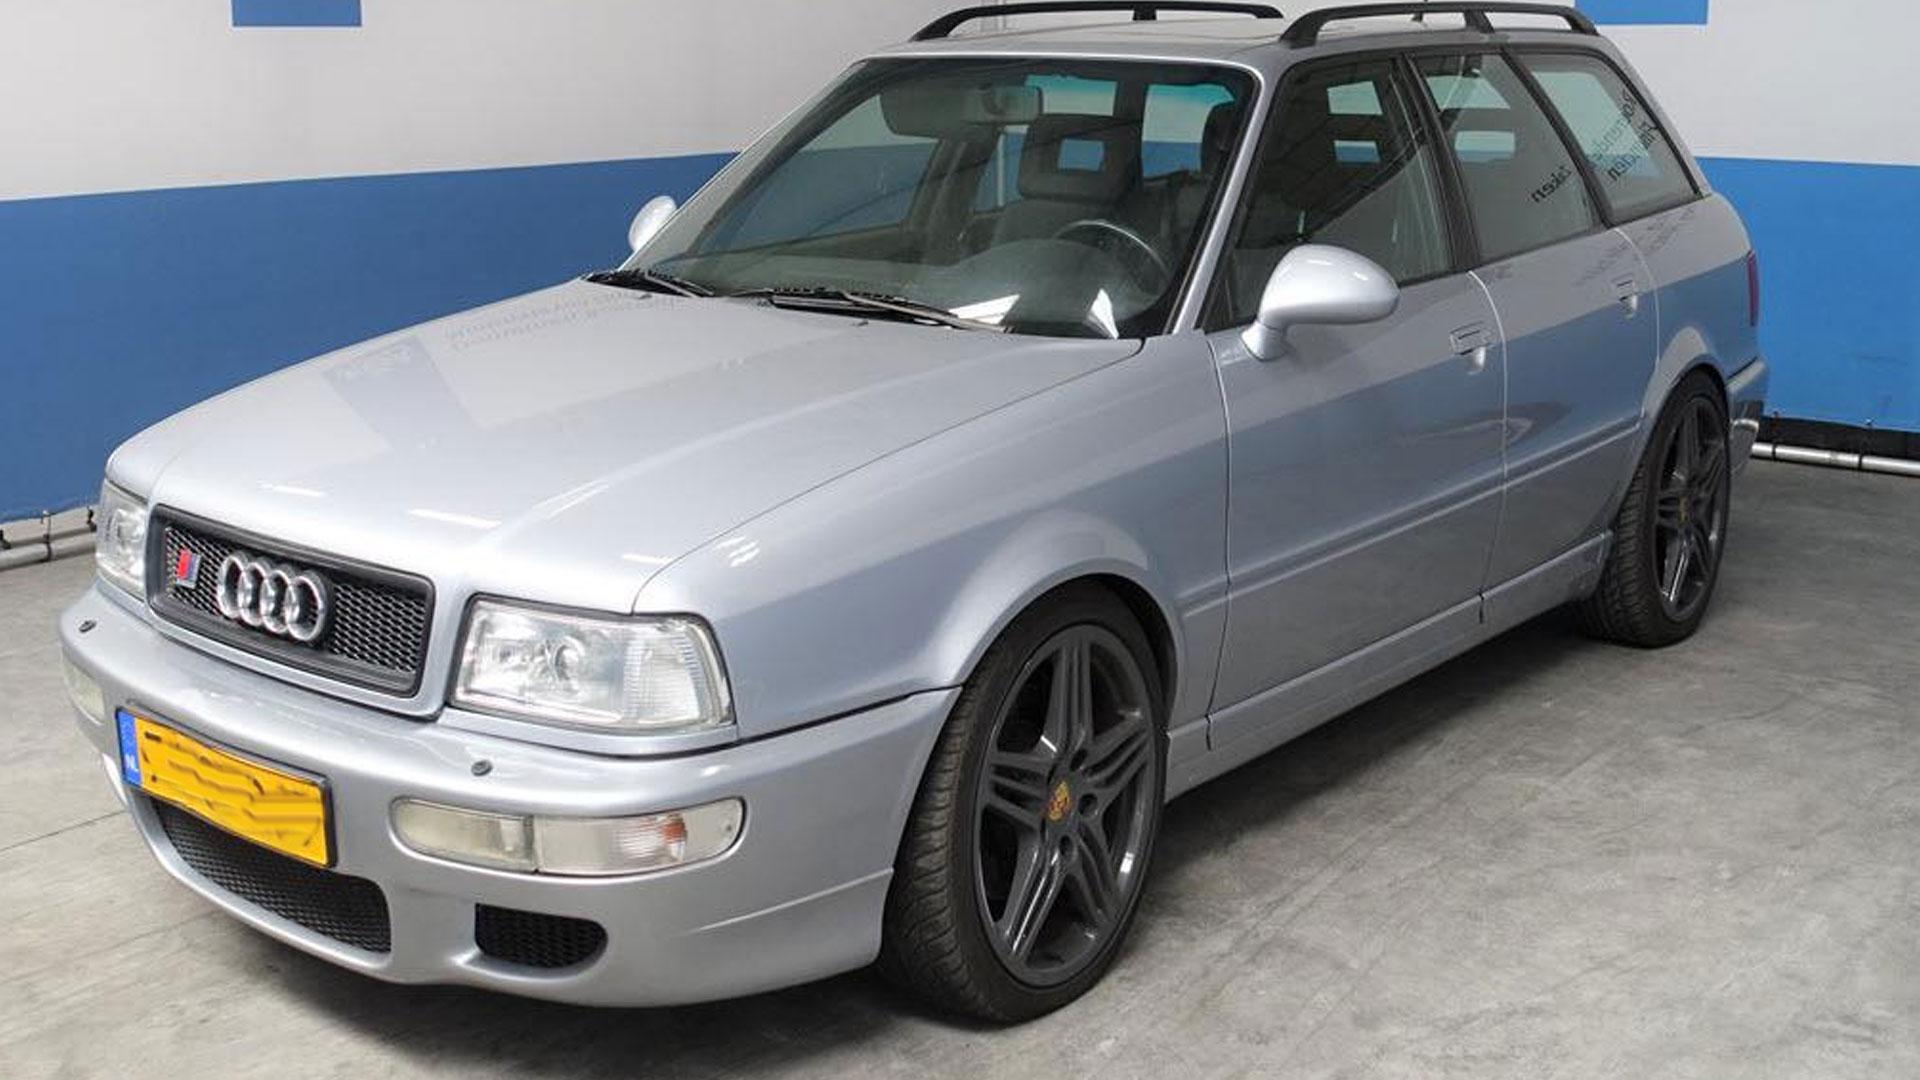 Audi RS 2 sedan